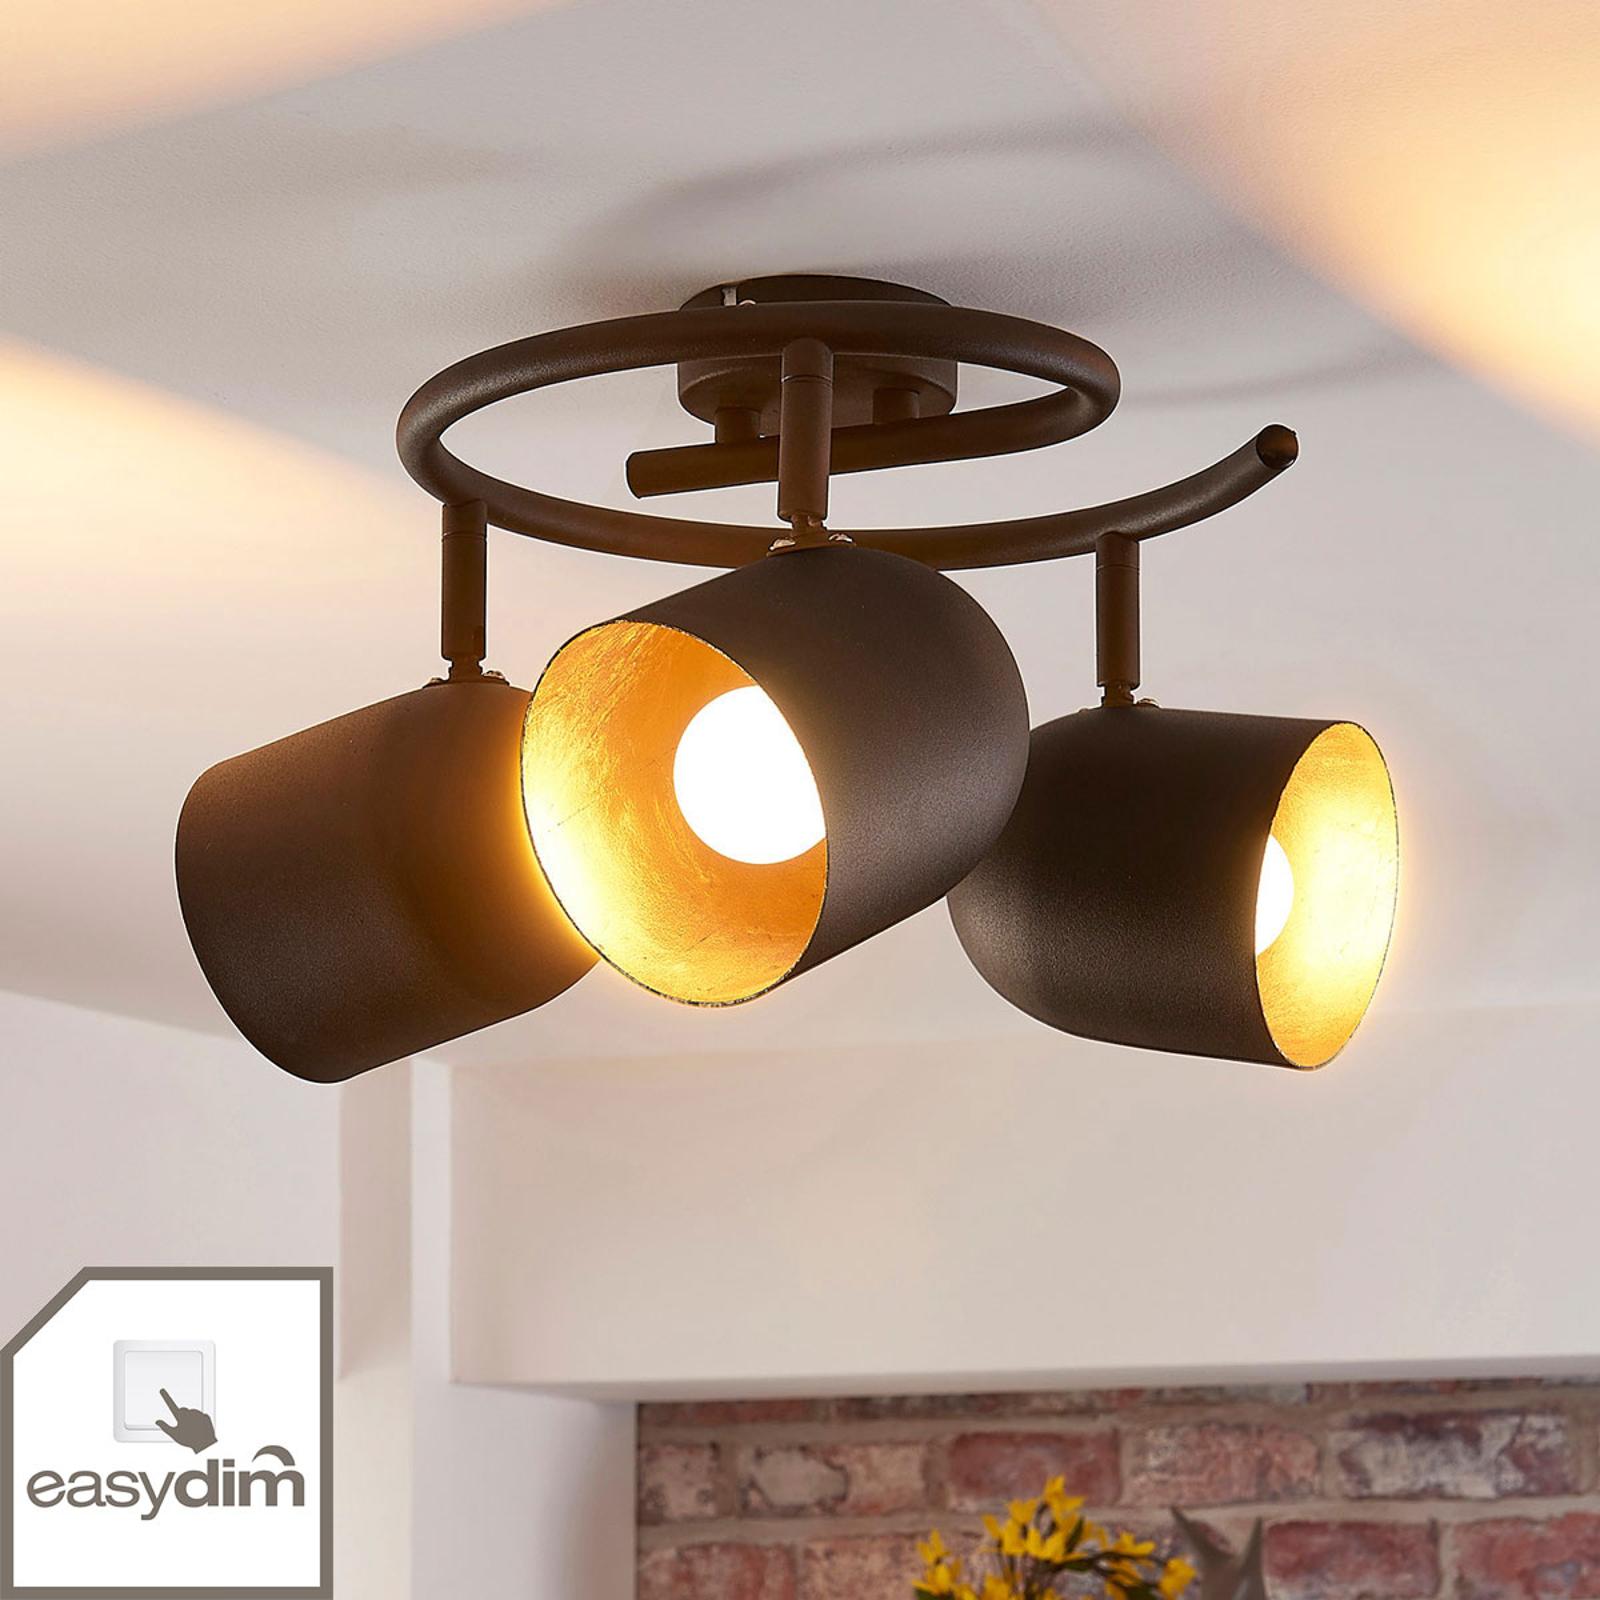 Czarno-złota lampa sufitowa LED Morik, easydim